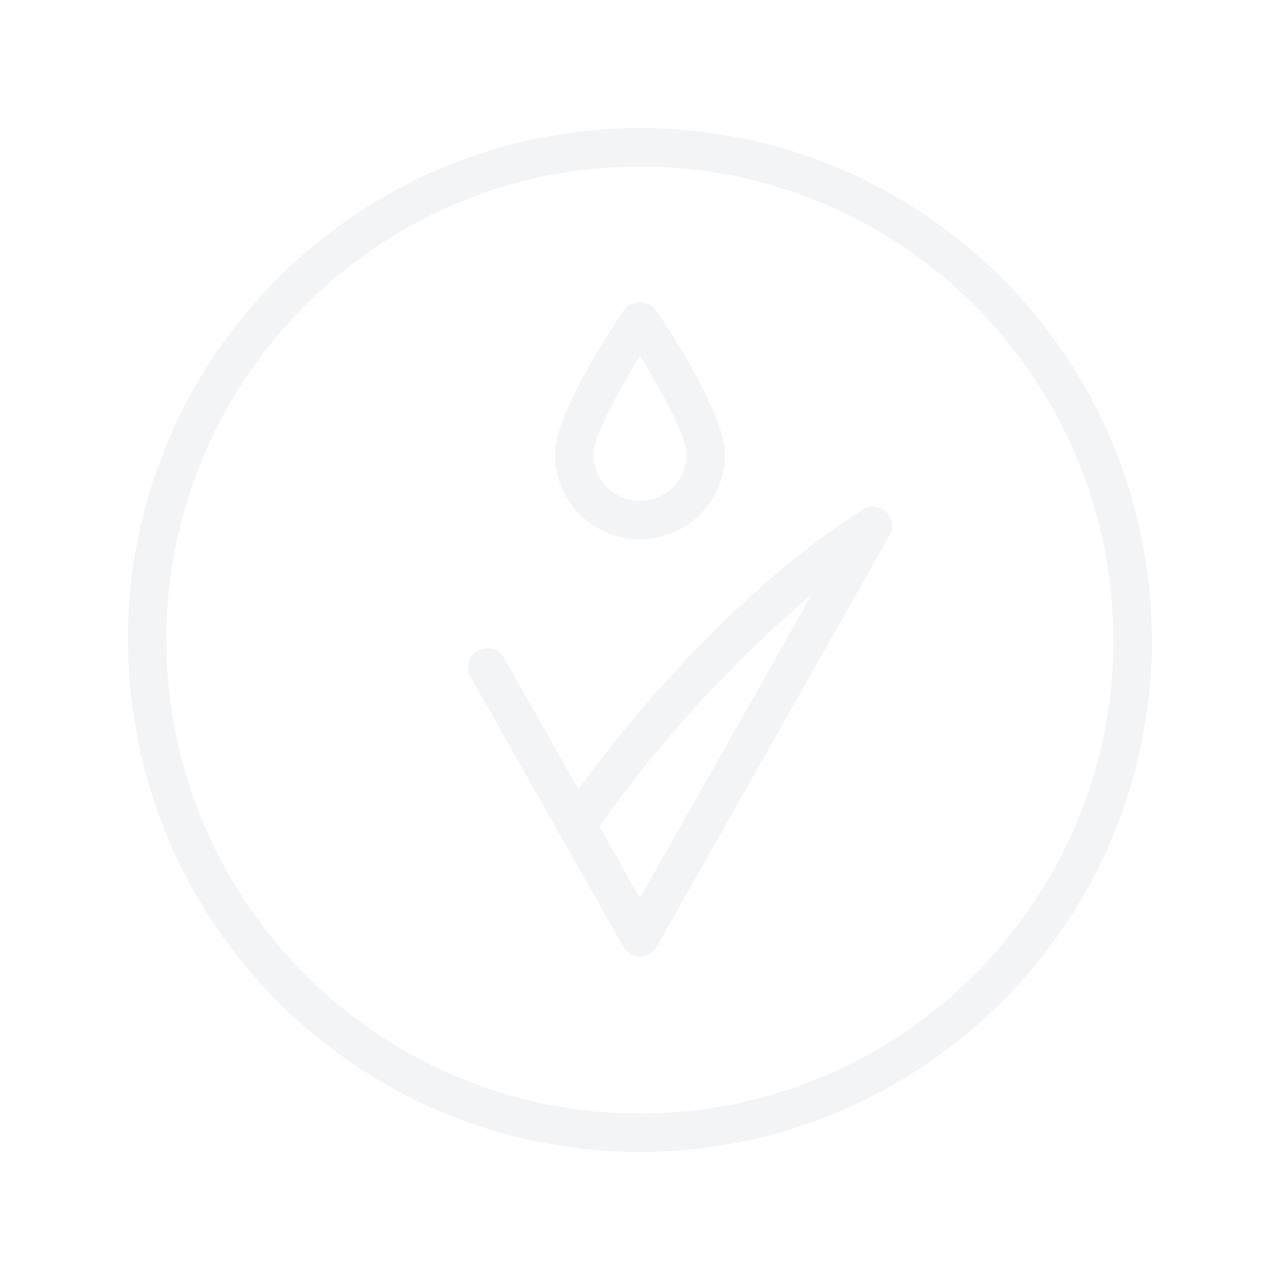 JOIK ORGANIC Citrus & Bergamot Seal Salt Scrub 240g